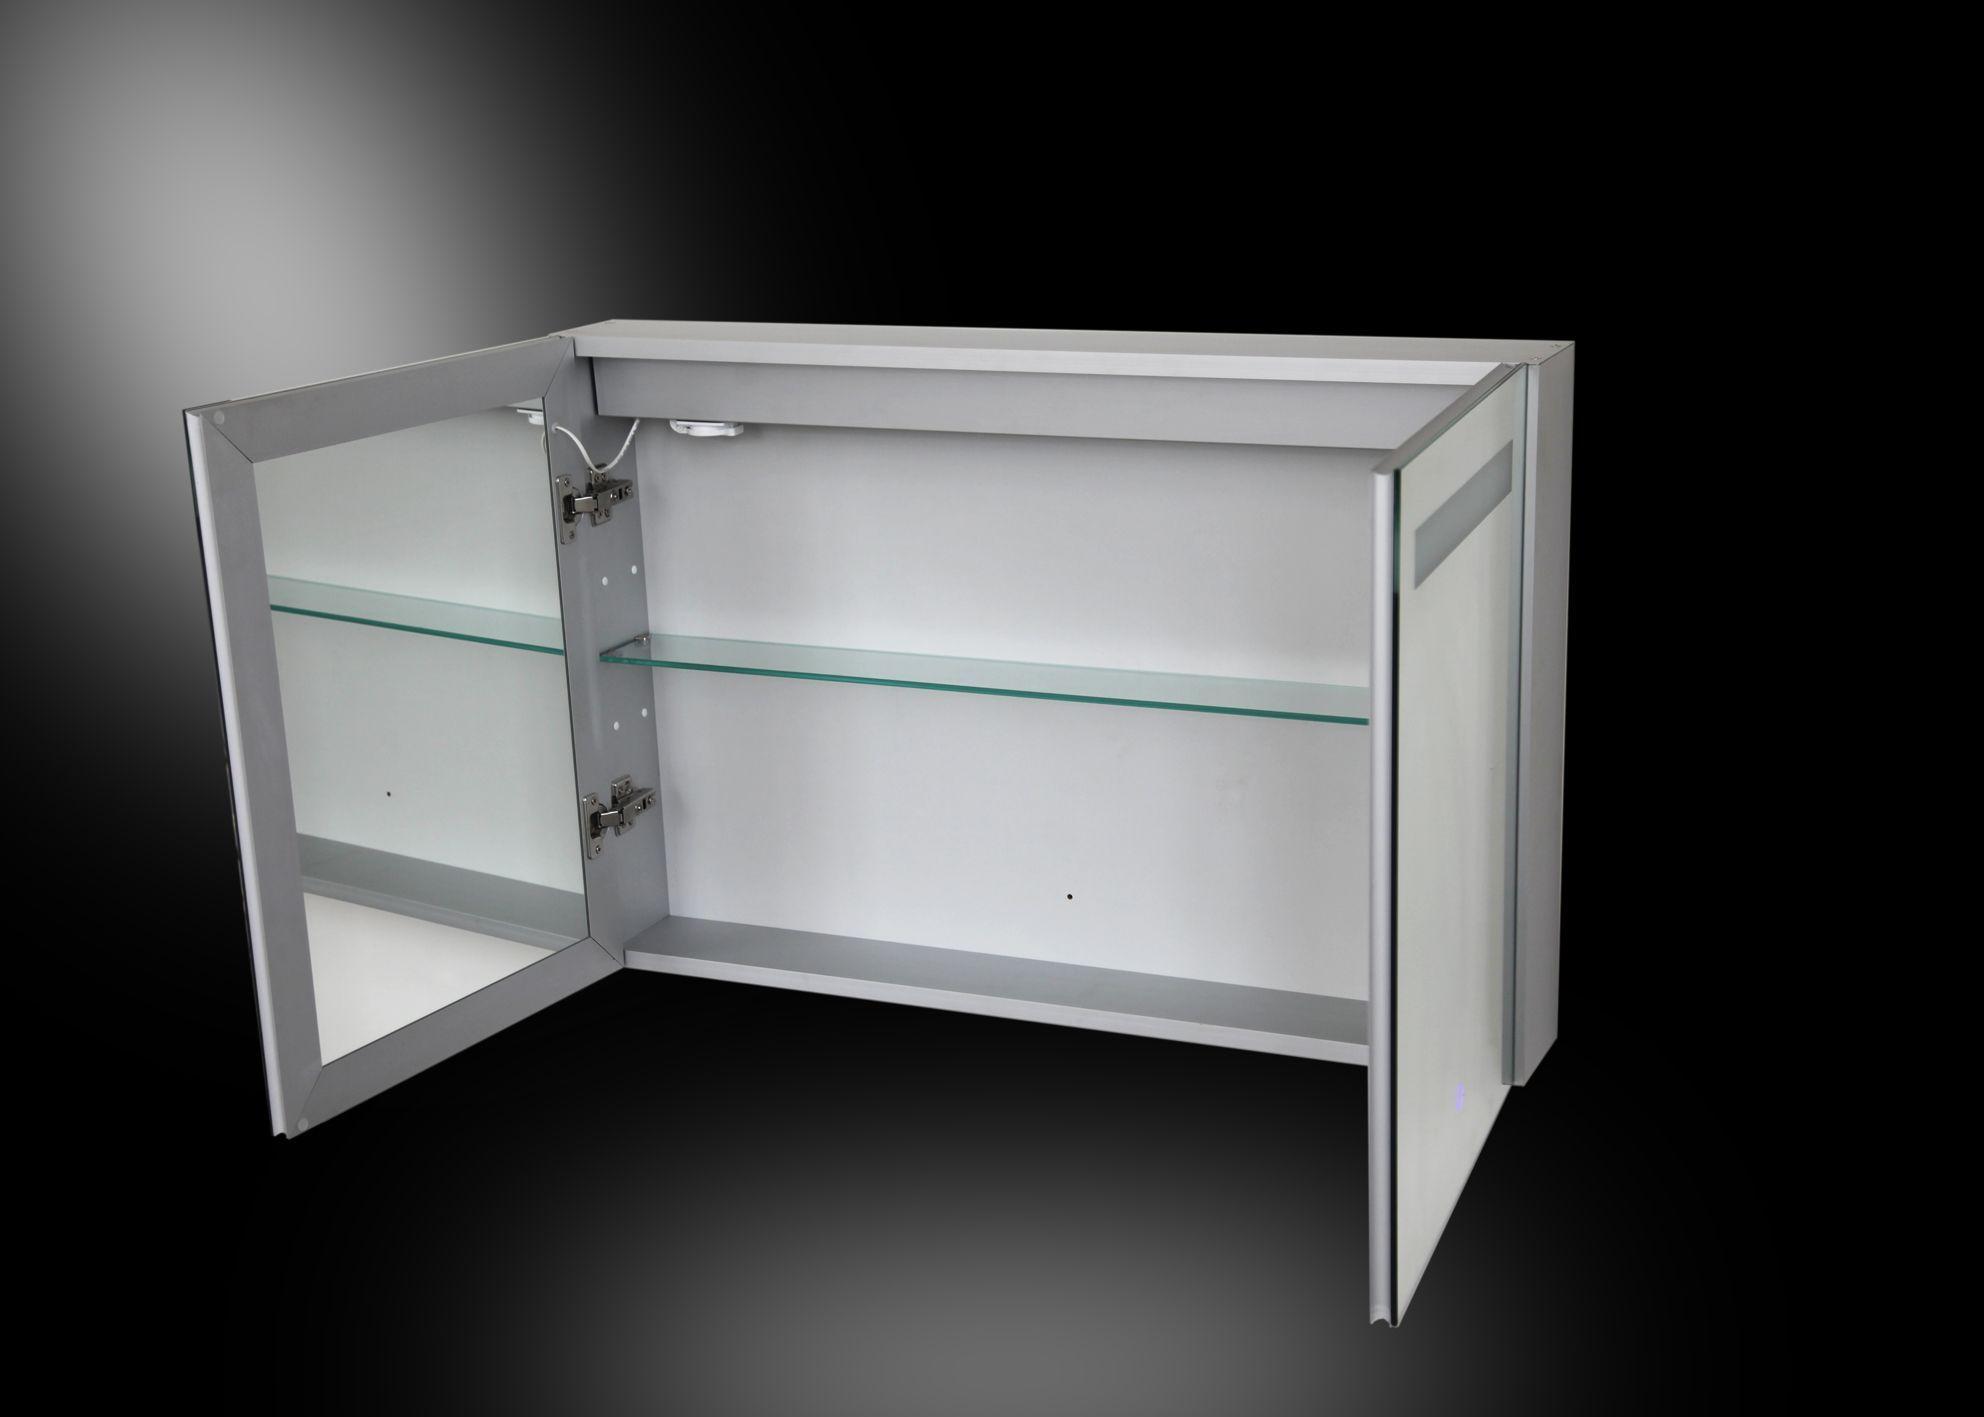 aluma spiegelkast led verlichting 900x600x135mm aluminium